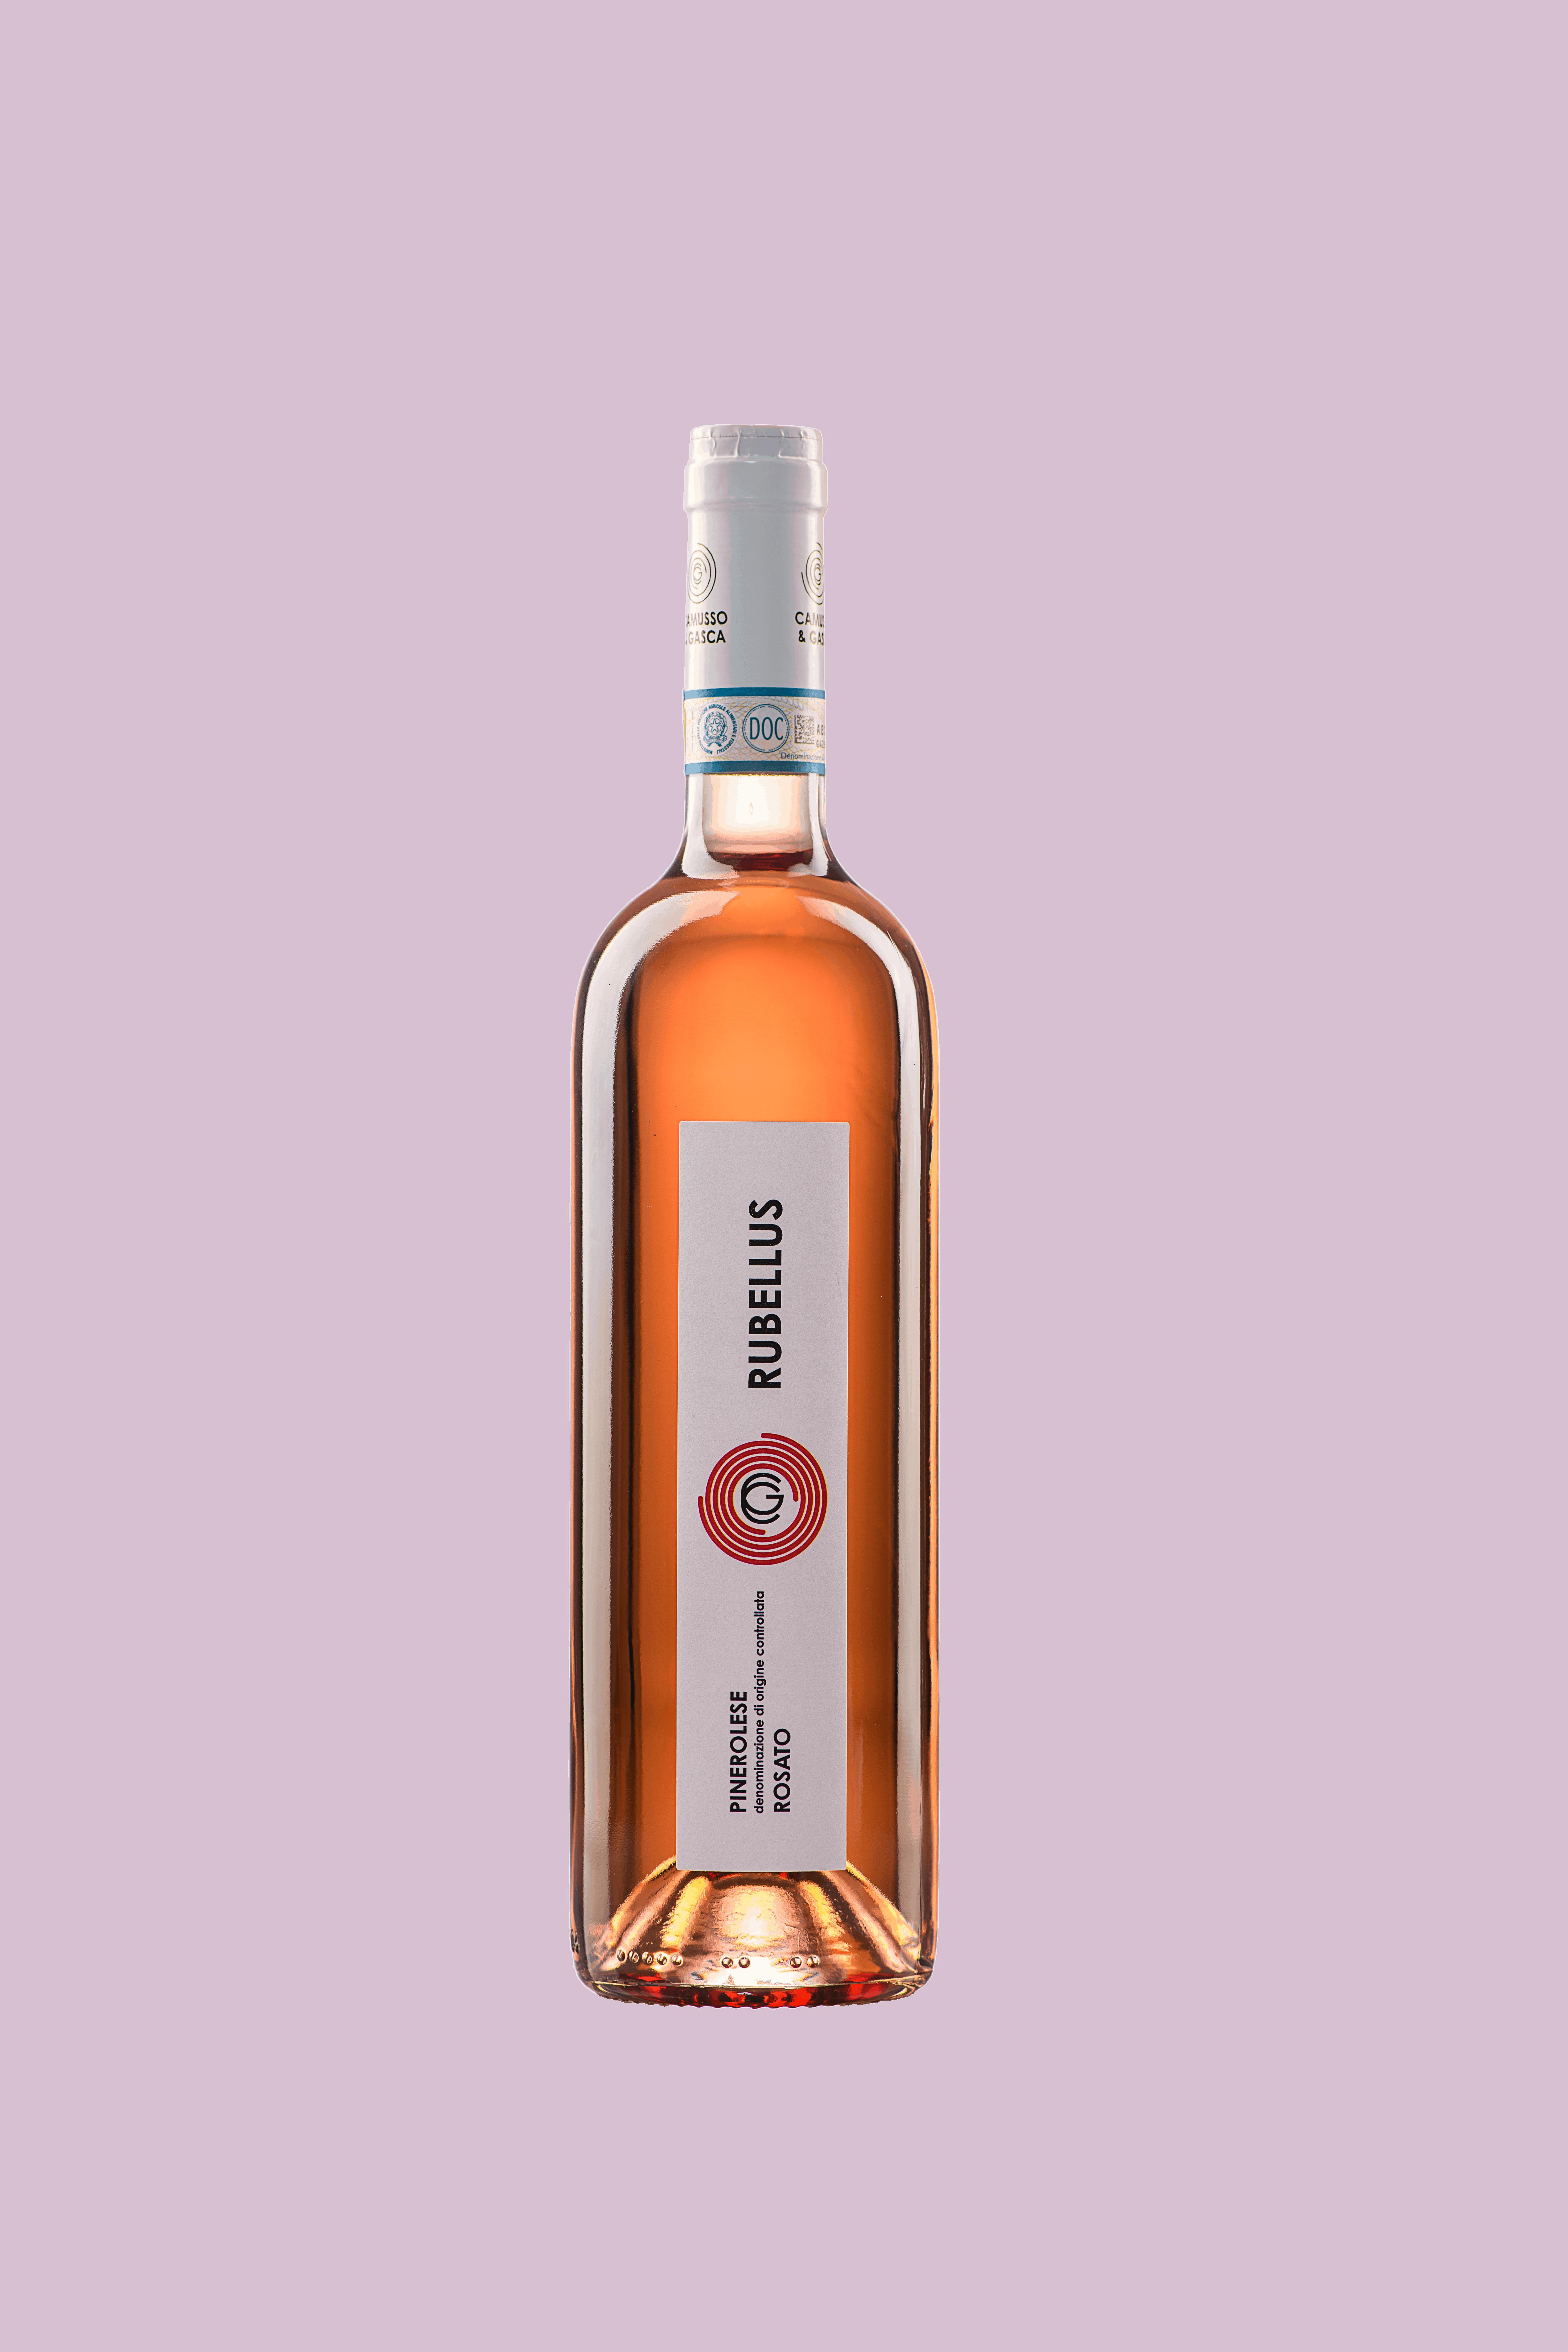 Rubellus, vino rosato